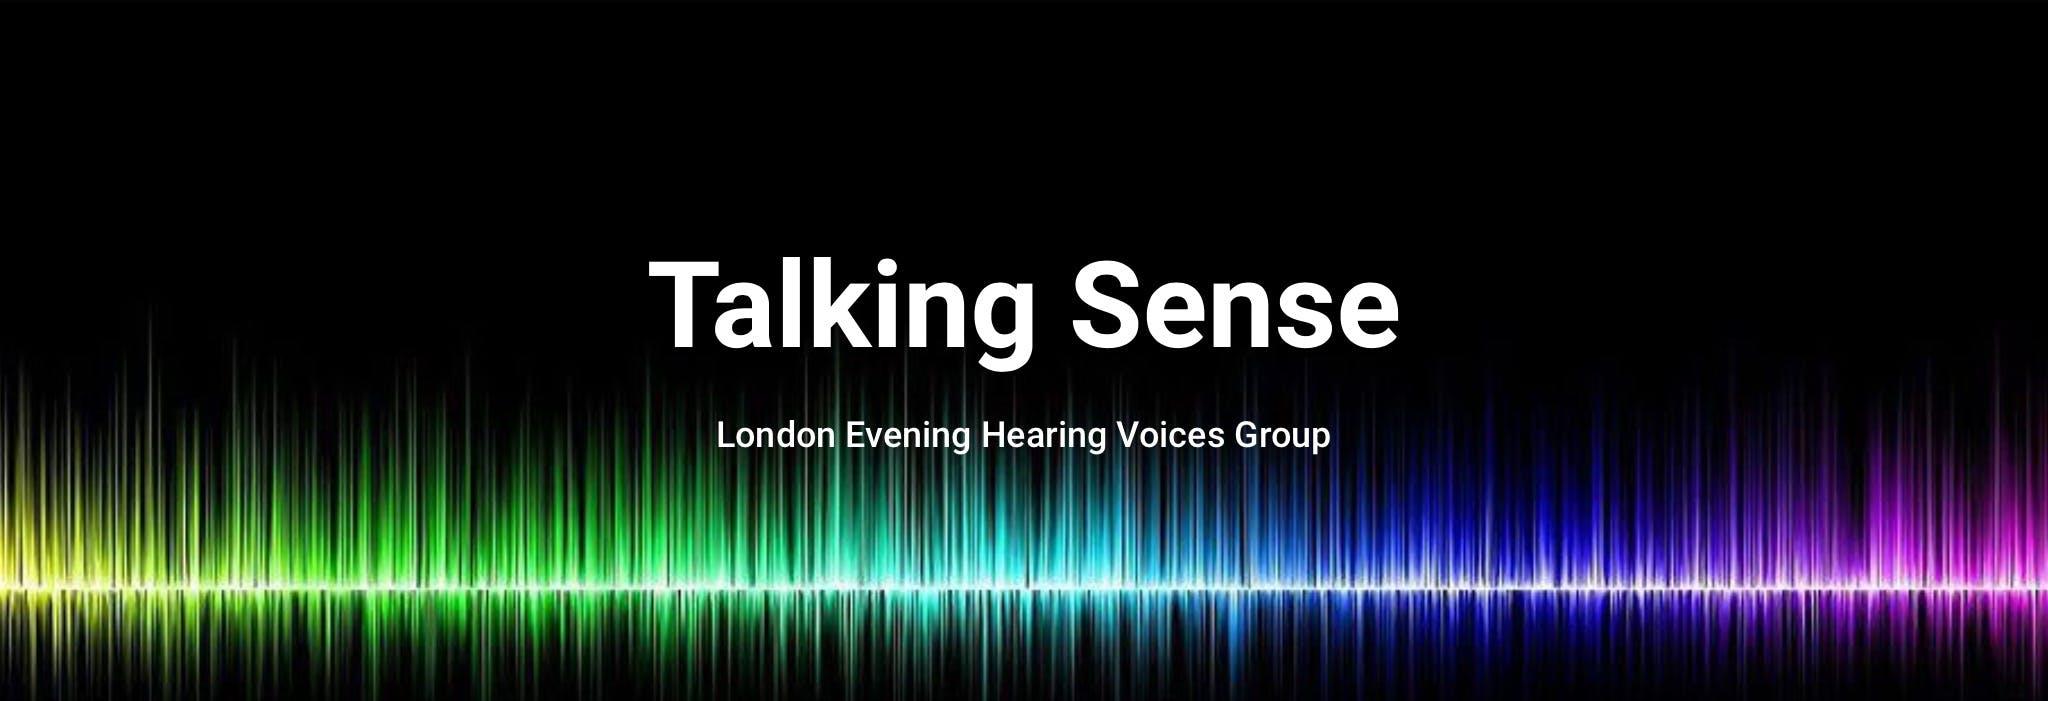 Talking Sense: An Evening Hearing Voices Grou